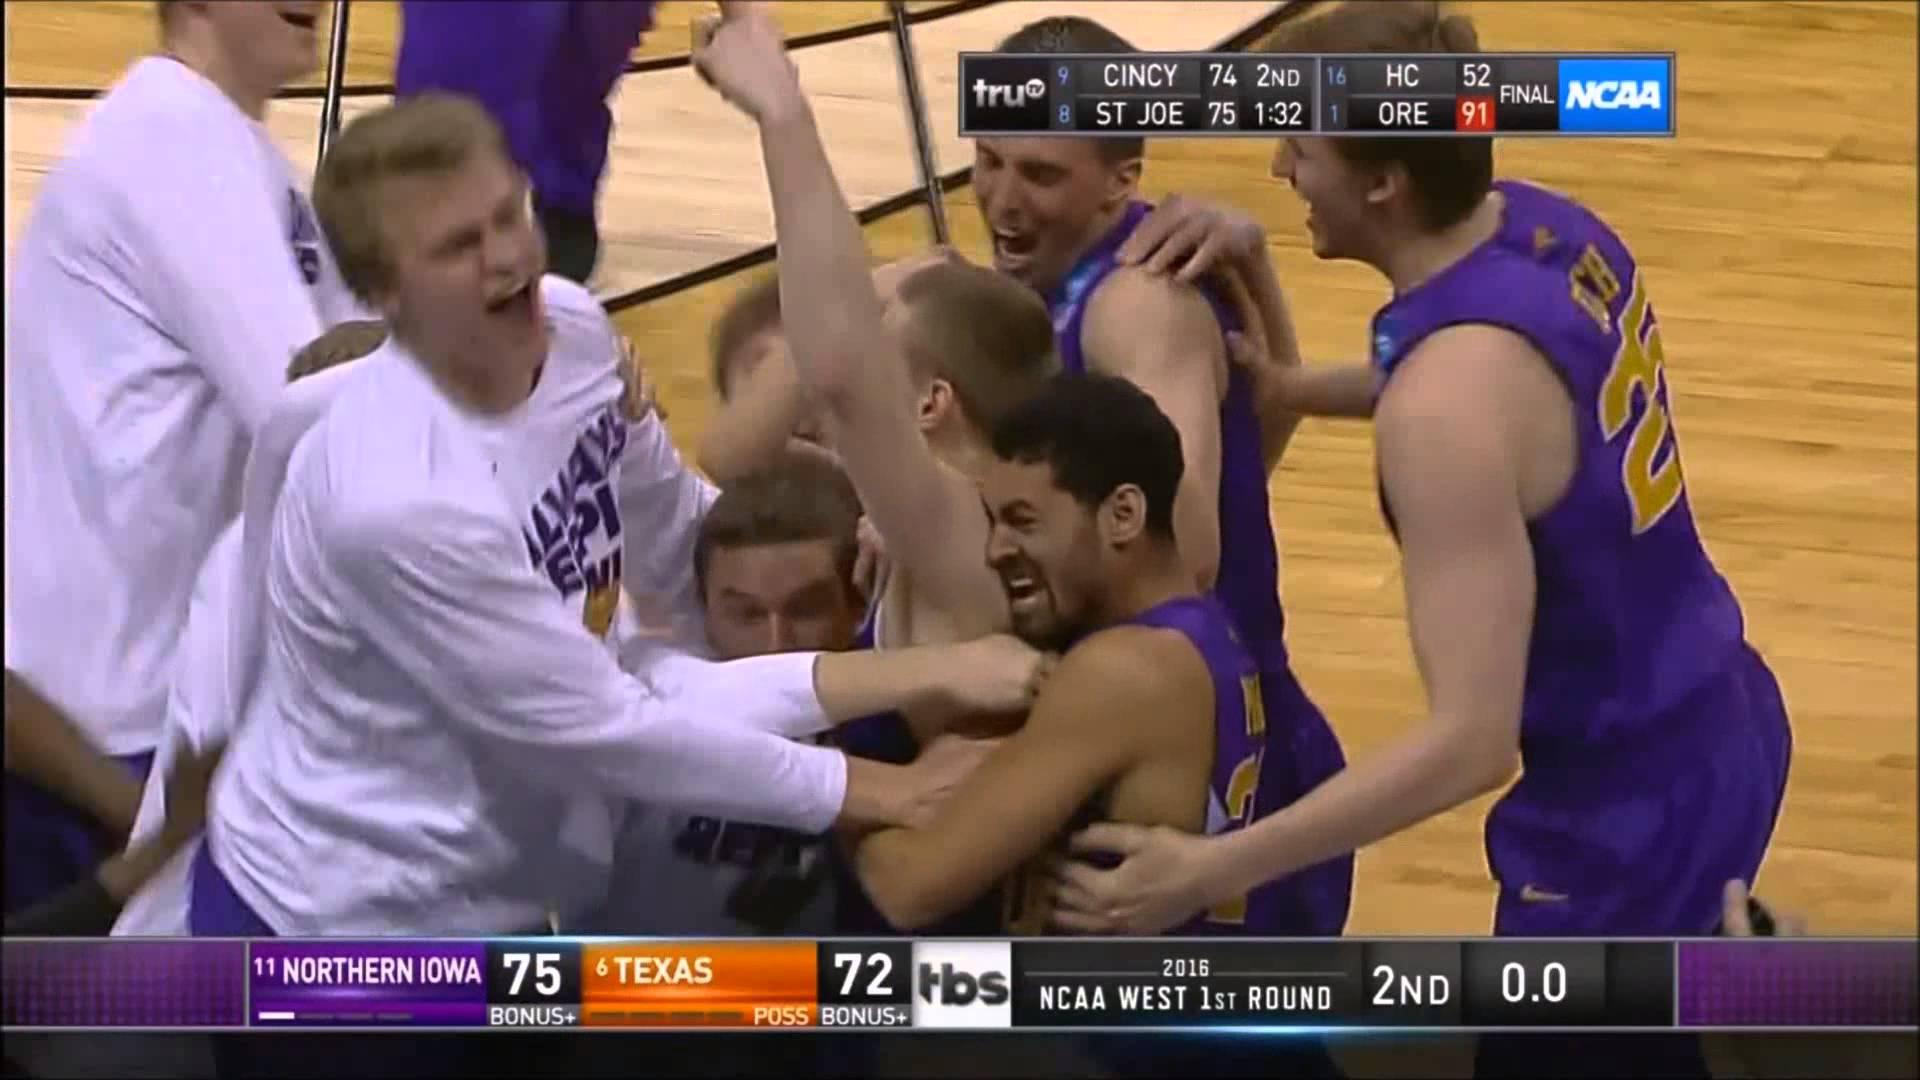 Northern Iowa hits half court buzzer beater to beat Texas